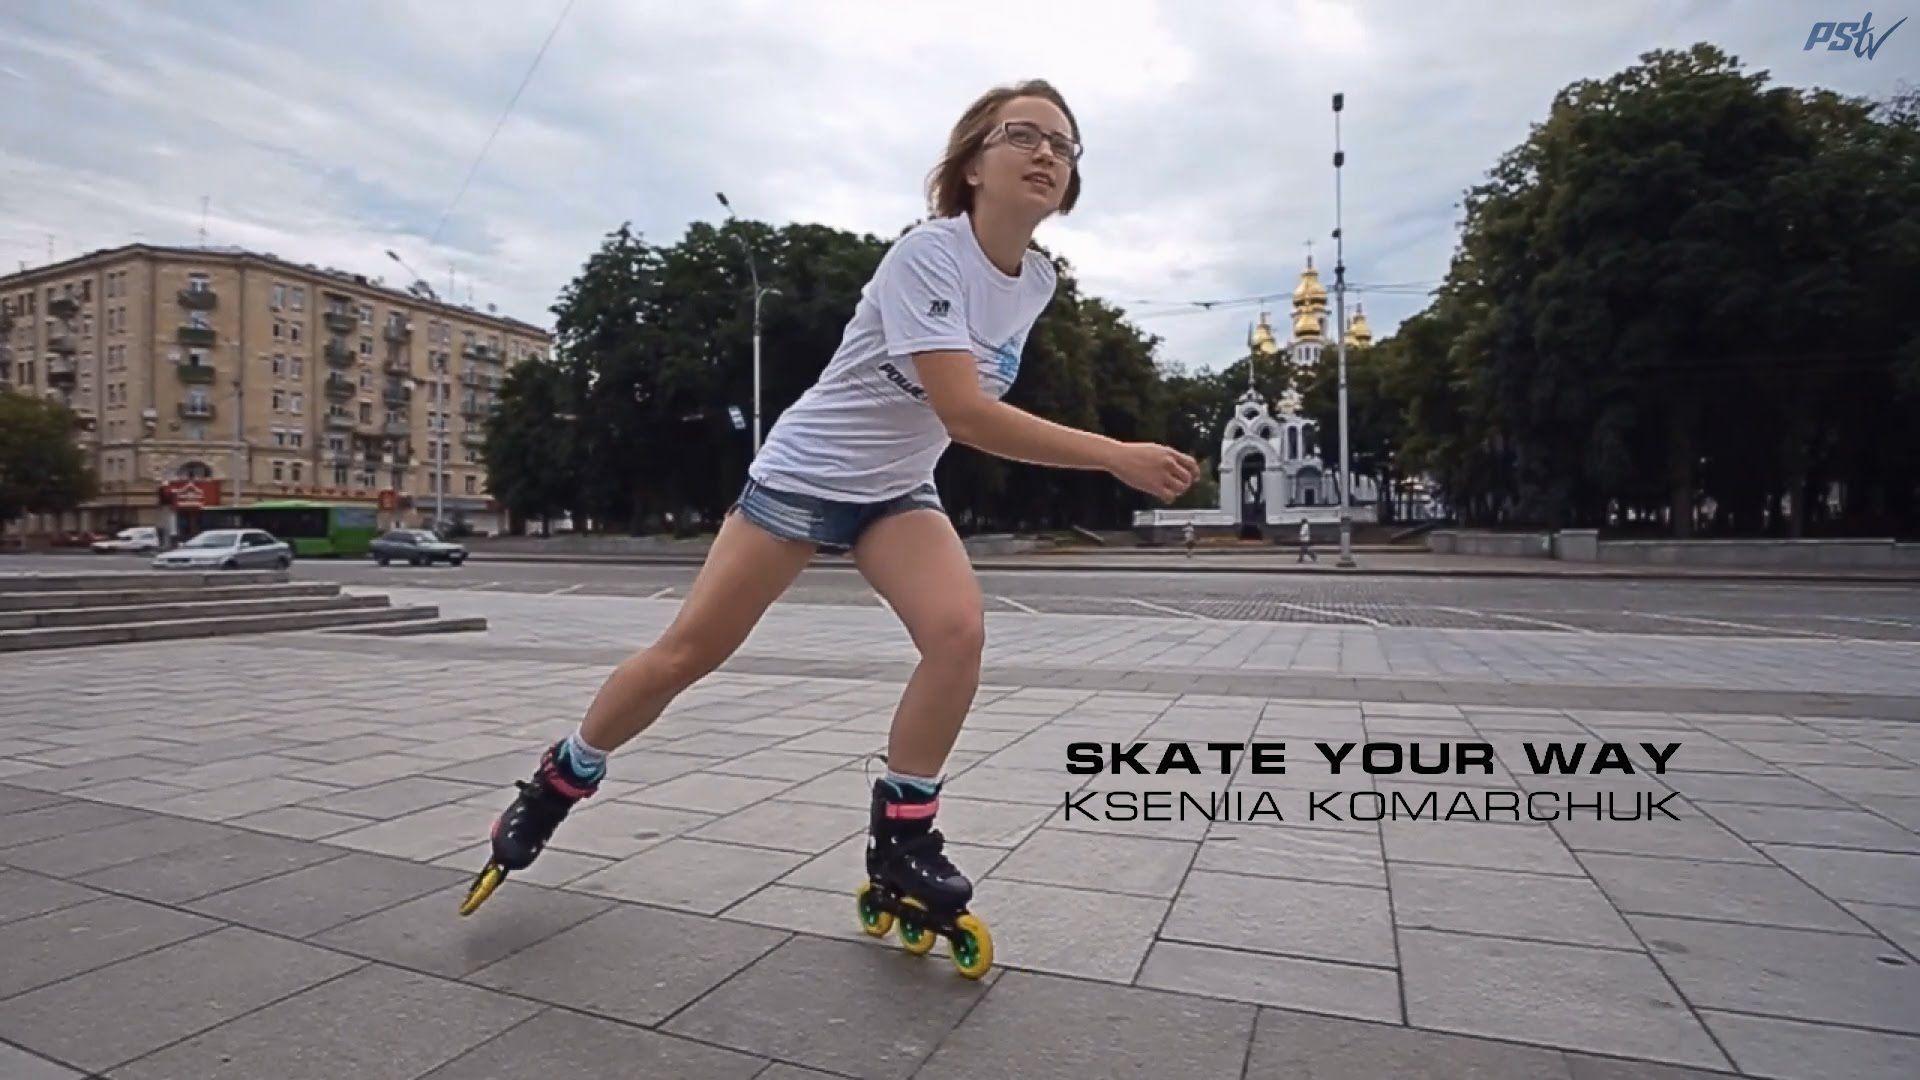 Skate Your Way Powerslide Inline Skates Kseniia Komarchuk Inline Skating Skate Inline